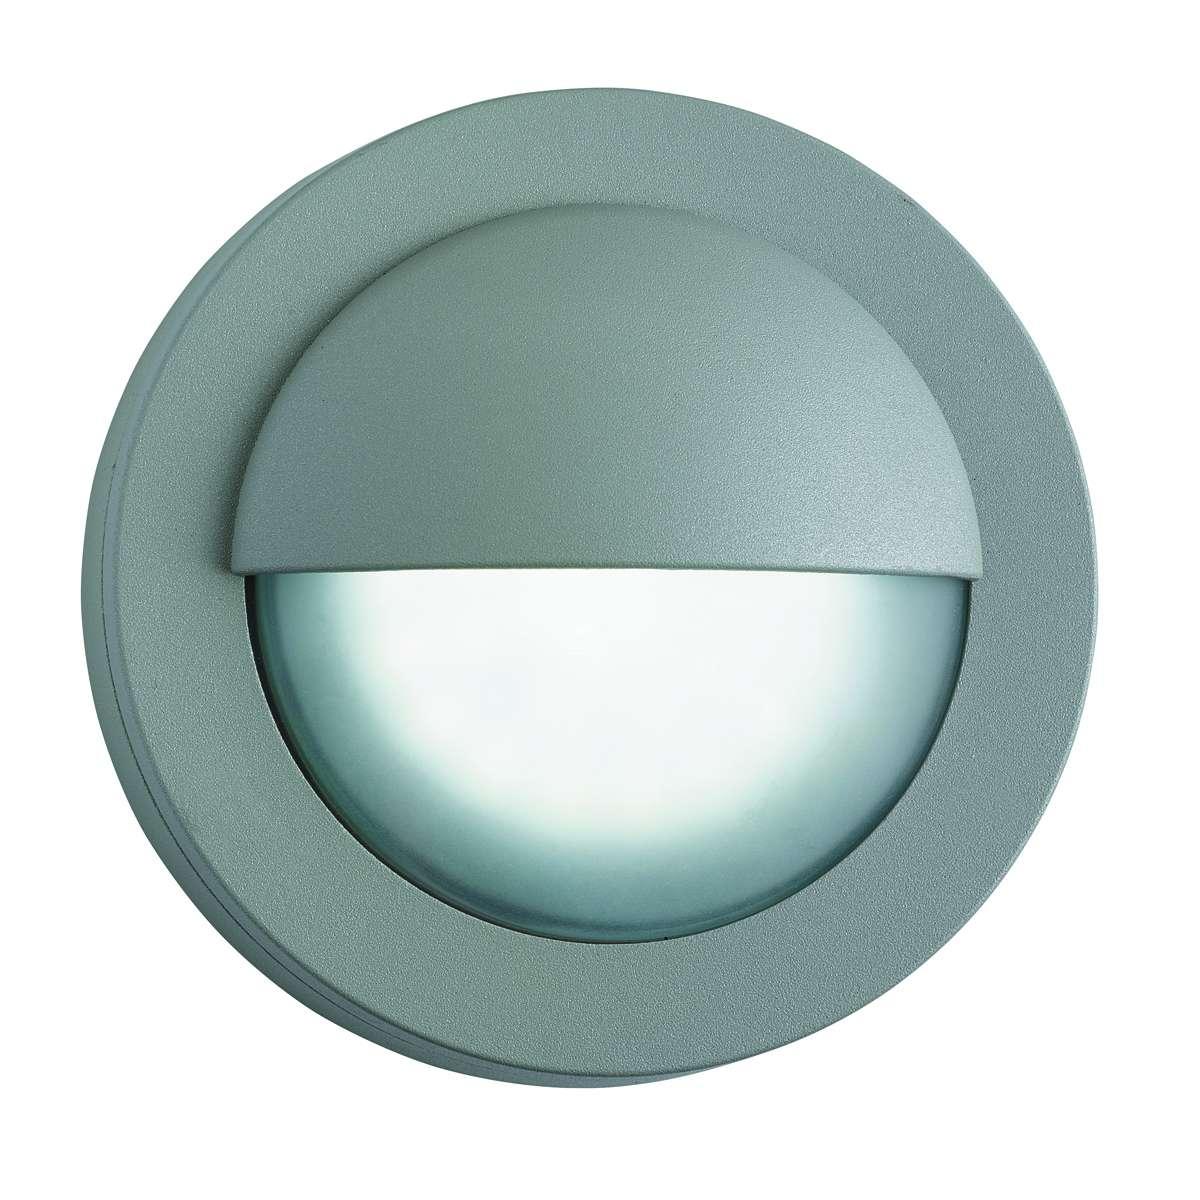 Ip44 Grey 18 Led Outdoor Wall Light With Acid Glass jrlighting.co.uk